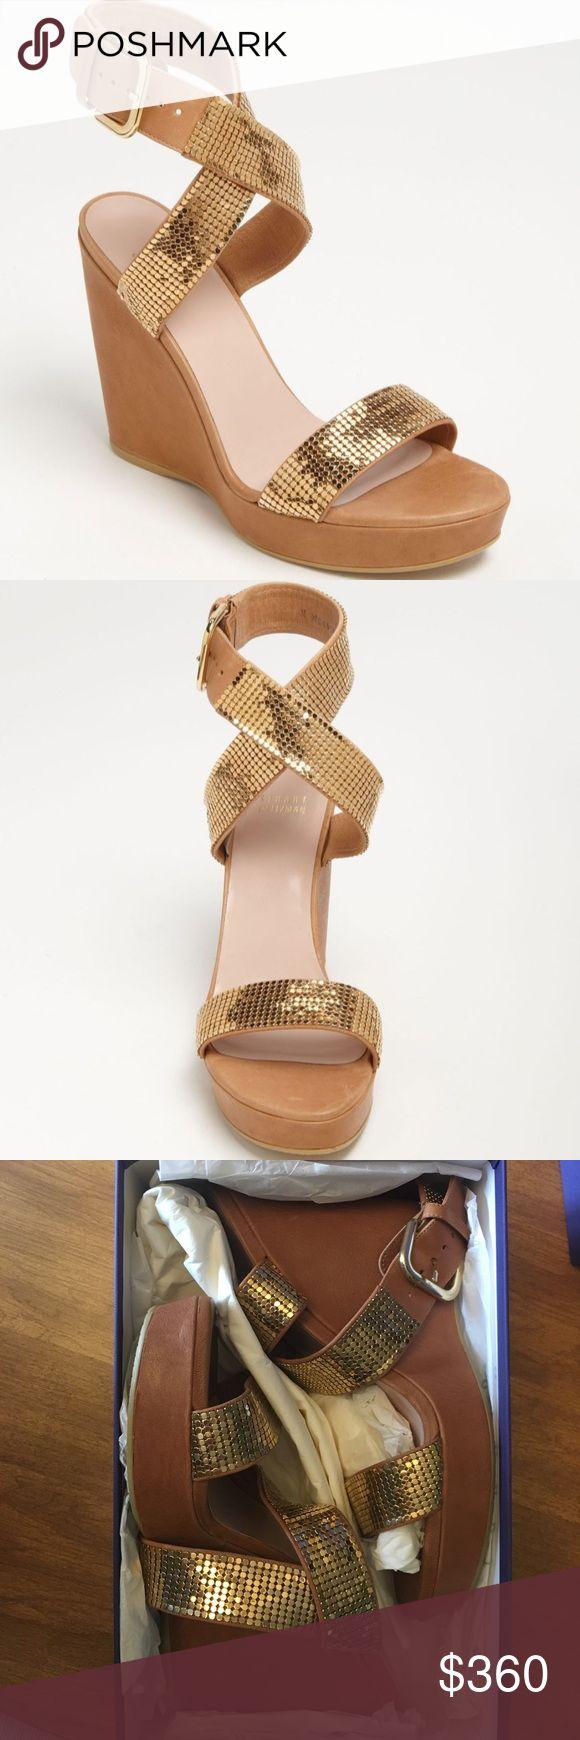 Sandales 9 Nudistsong Tissu Paillette GoldStuart Weitzman tM11K